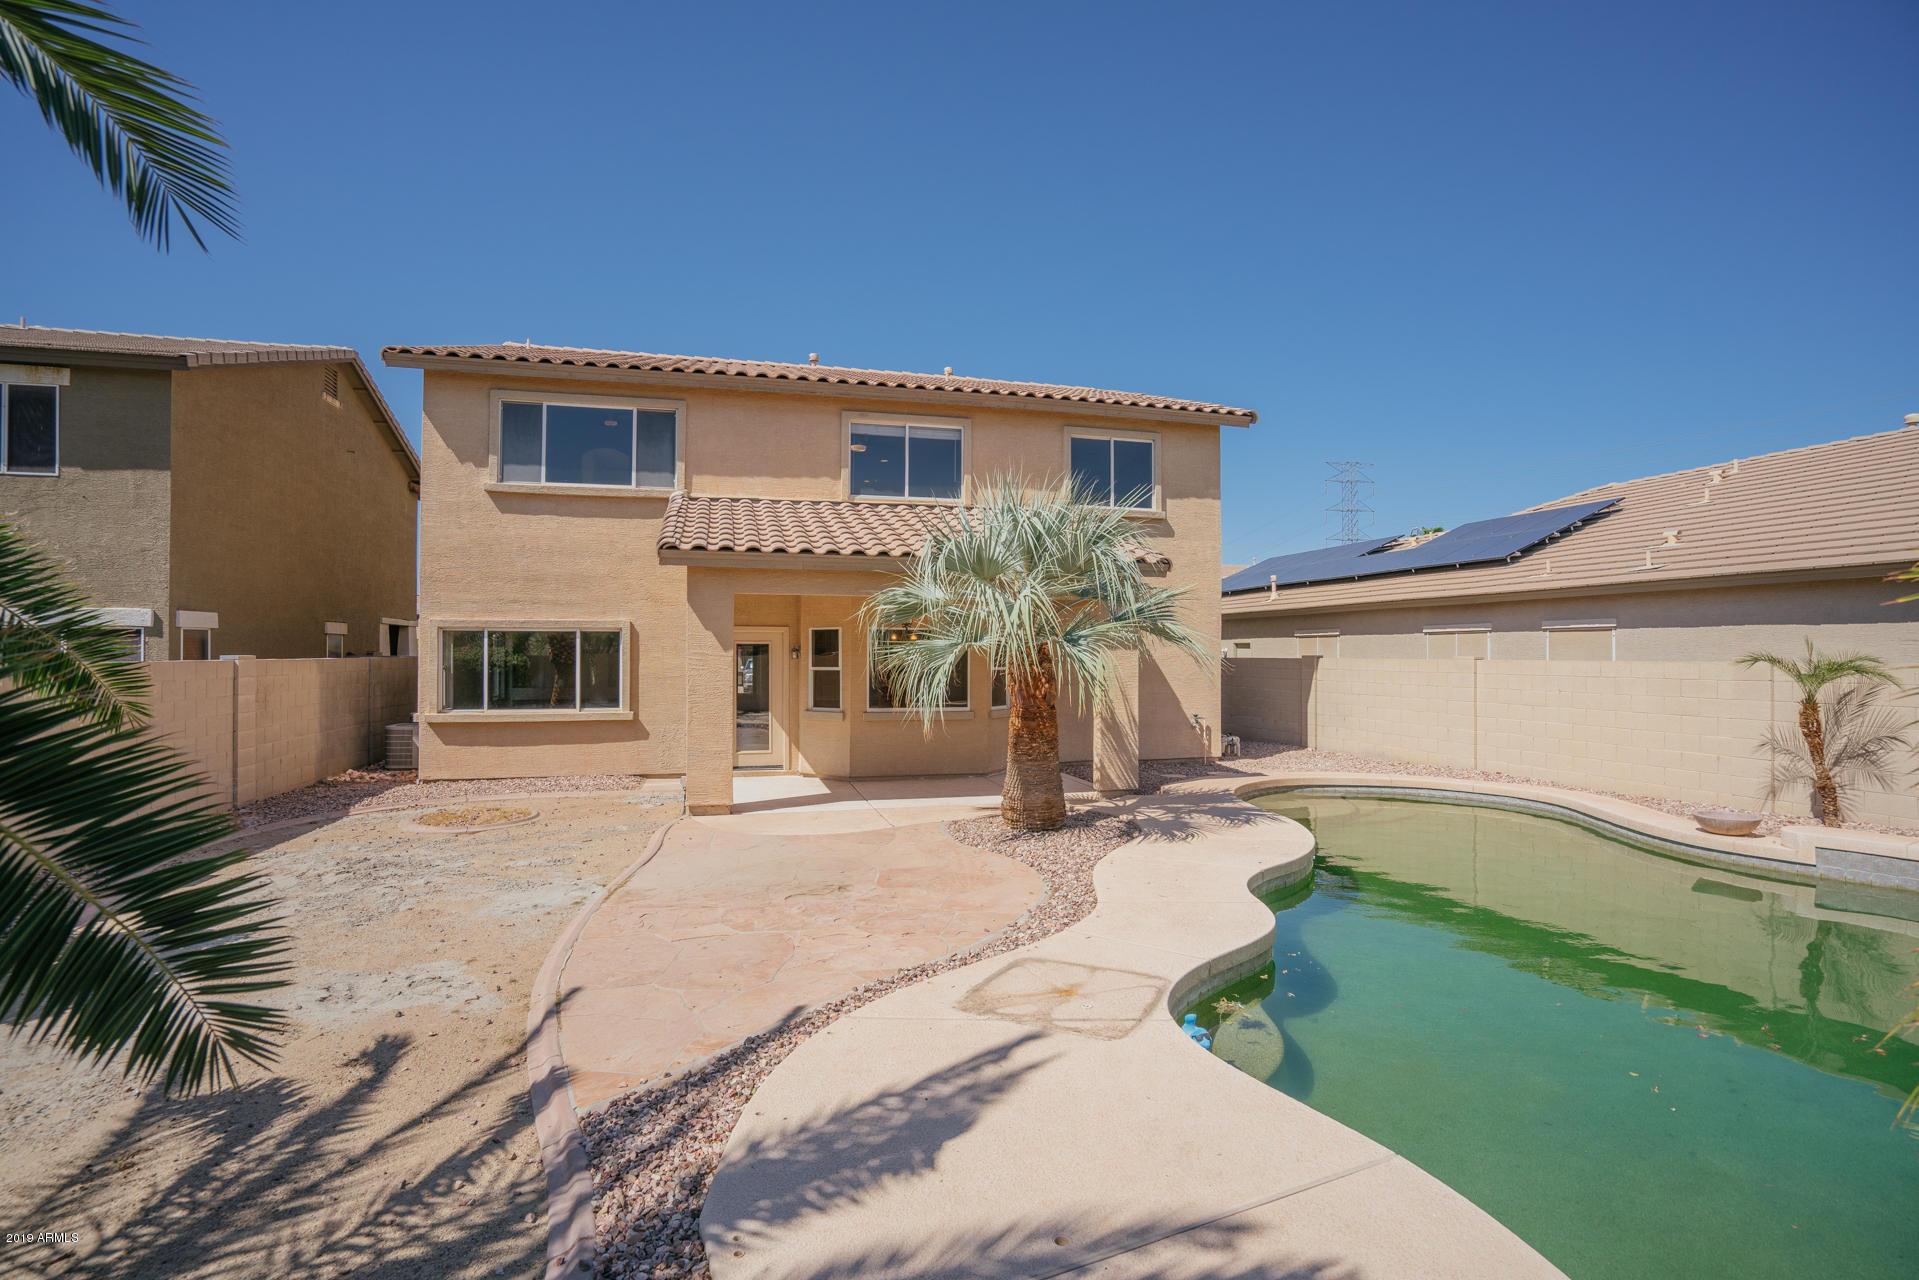 MLS 5971367 12209 W MONROE Street, Avondale, AZ 85323 Avondale AZ Golf